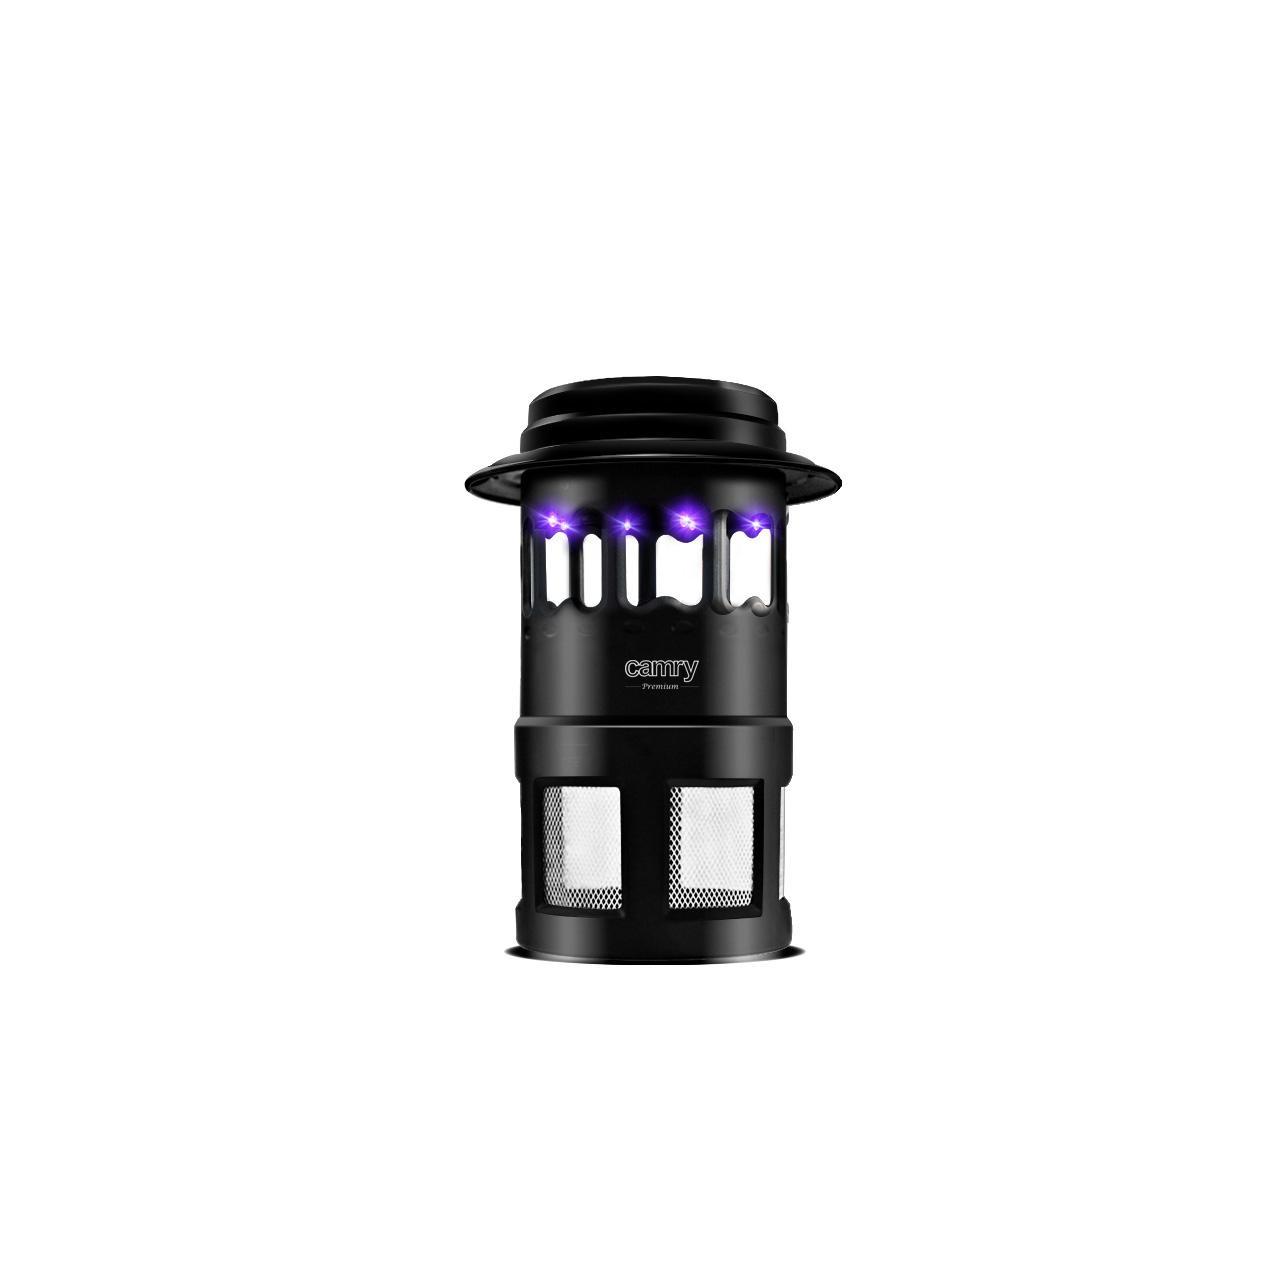 Aparat antitantari cu lampa UV si ventilator Camry  CR 7936, Negru